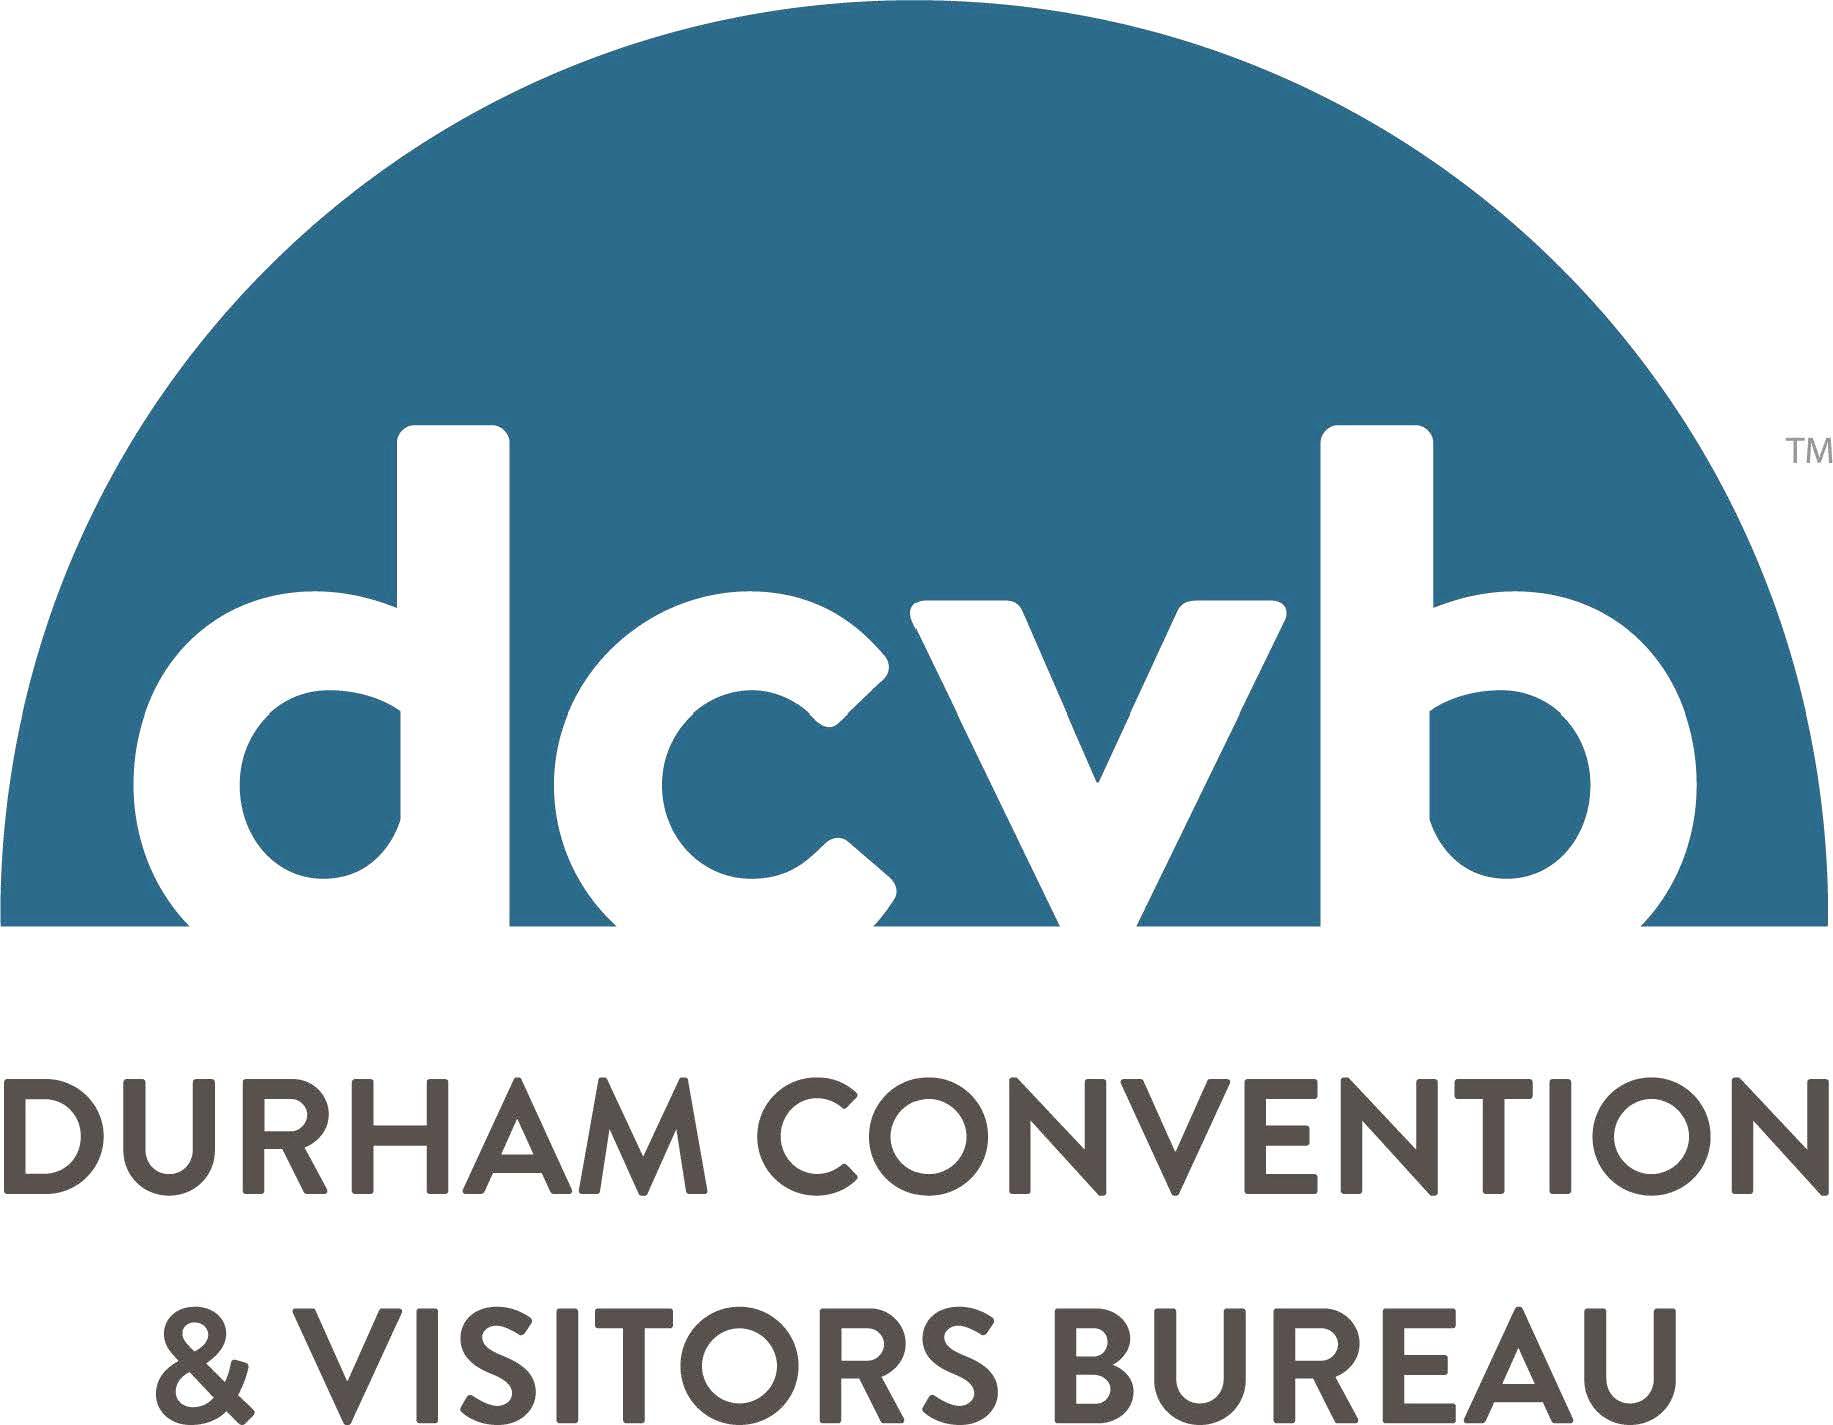 dcvb logo 1.jpg